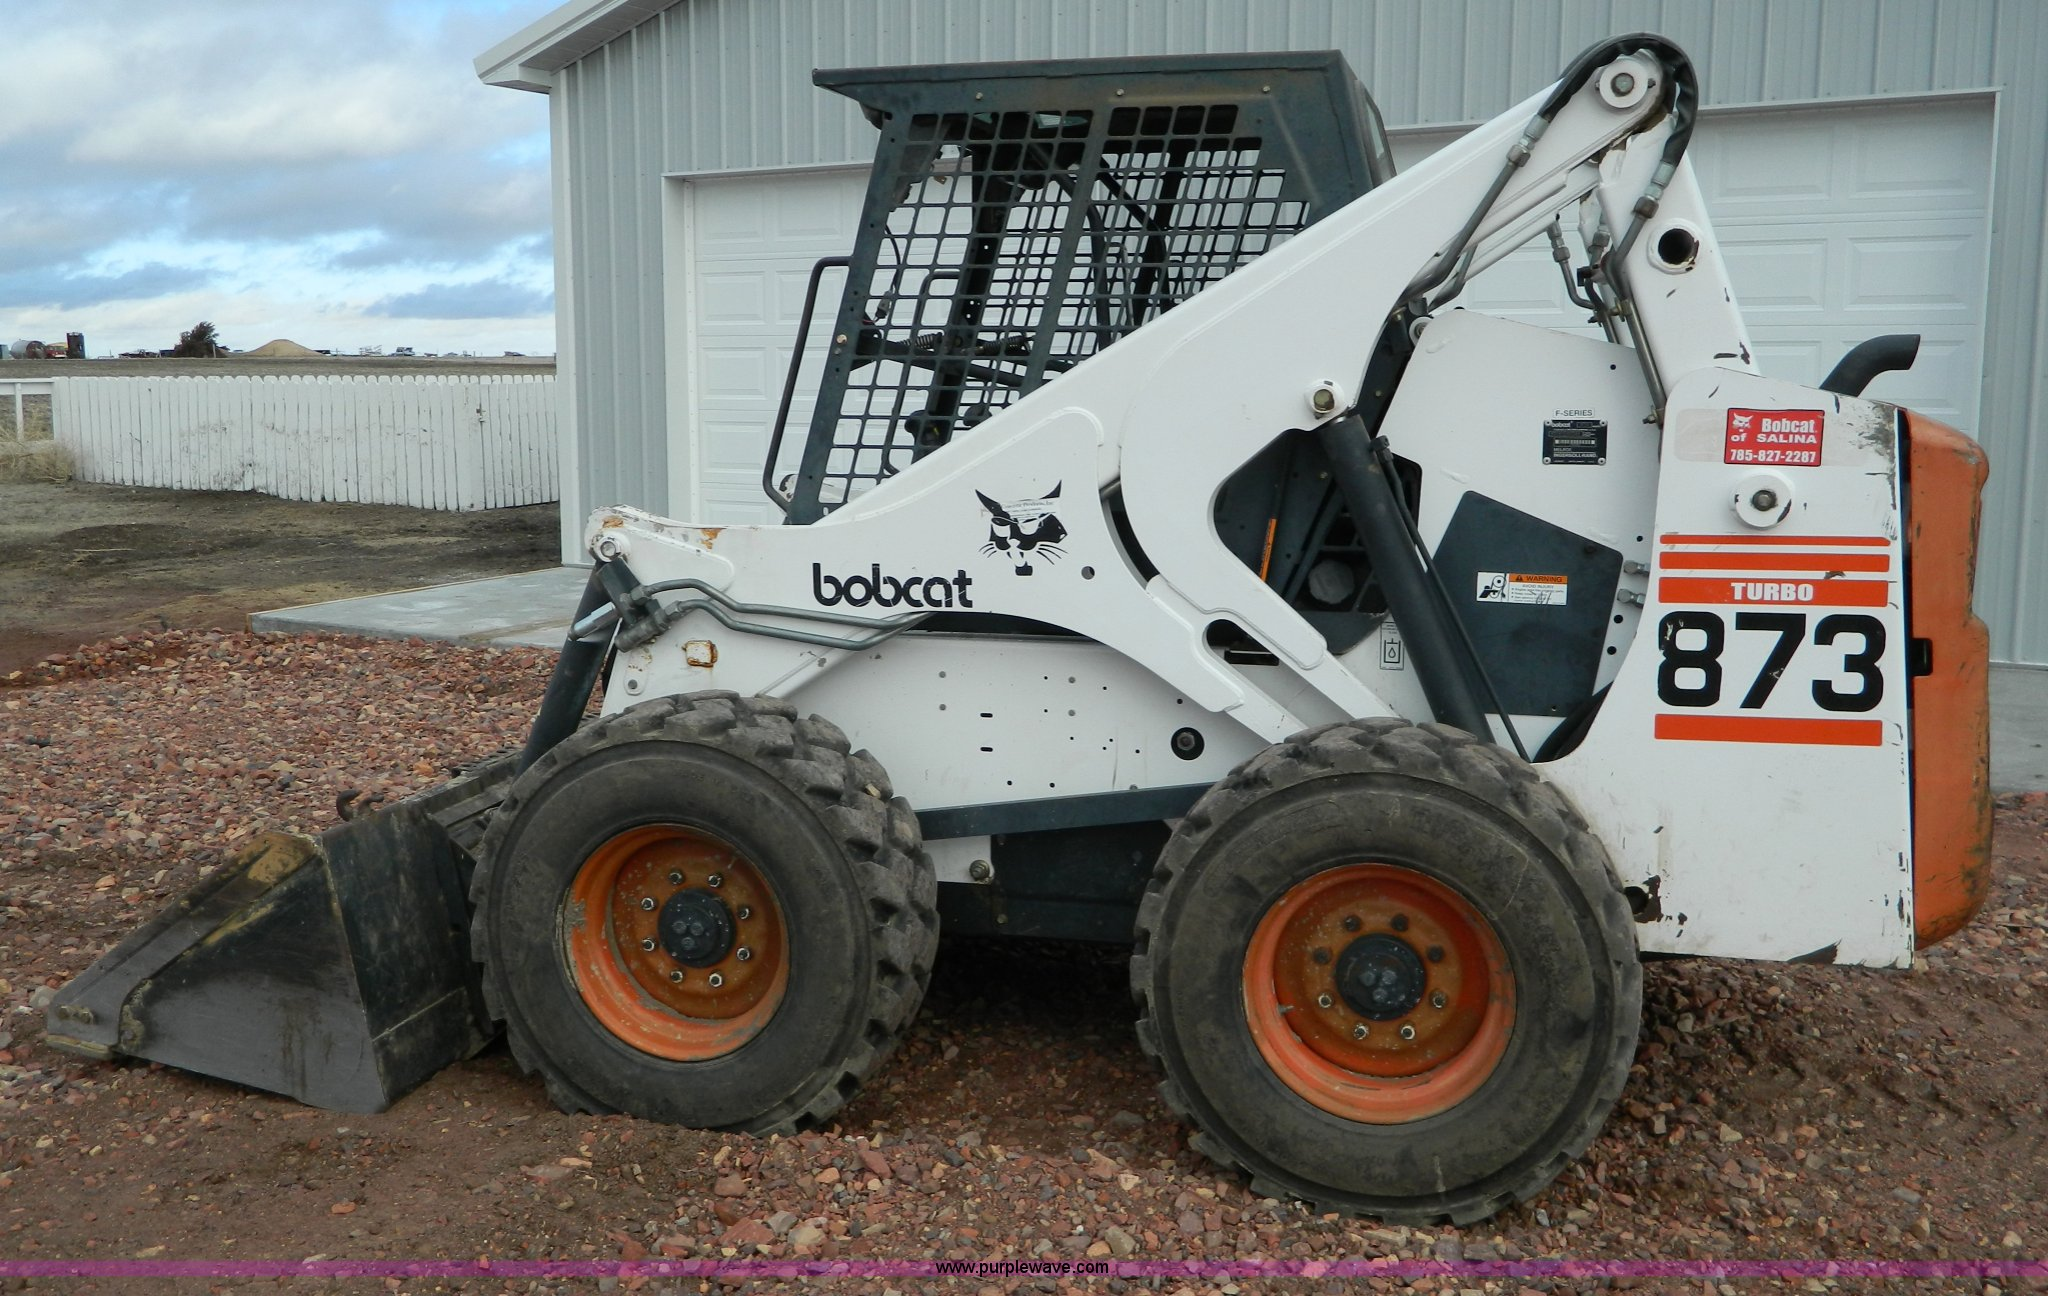 873 bobcat engine - Full Size In New Window